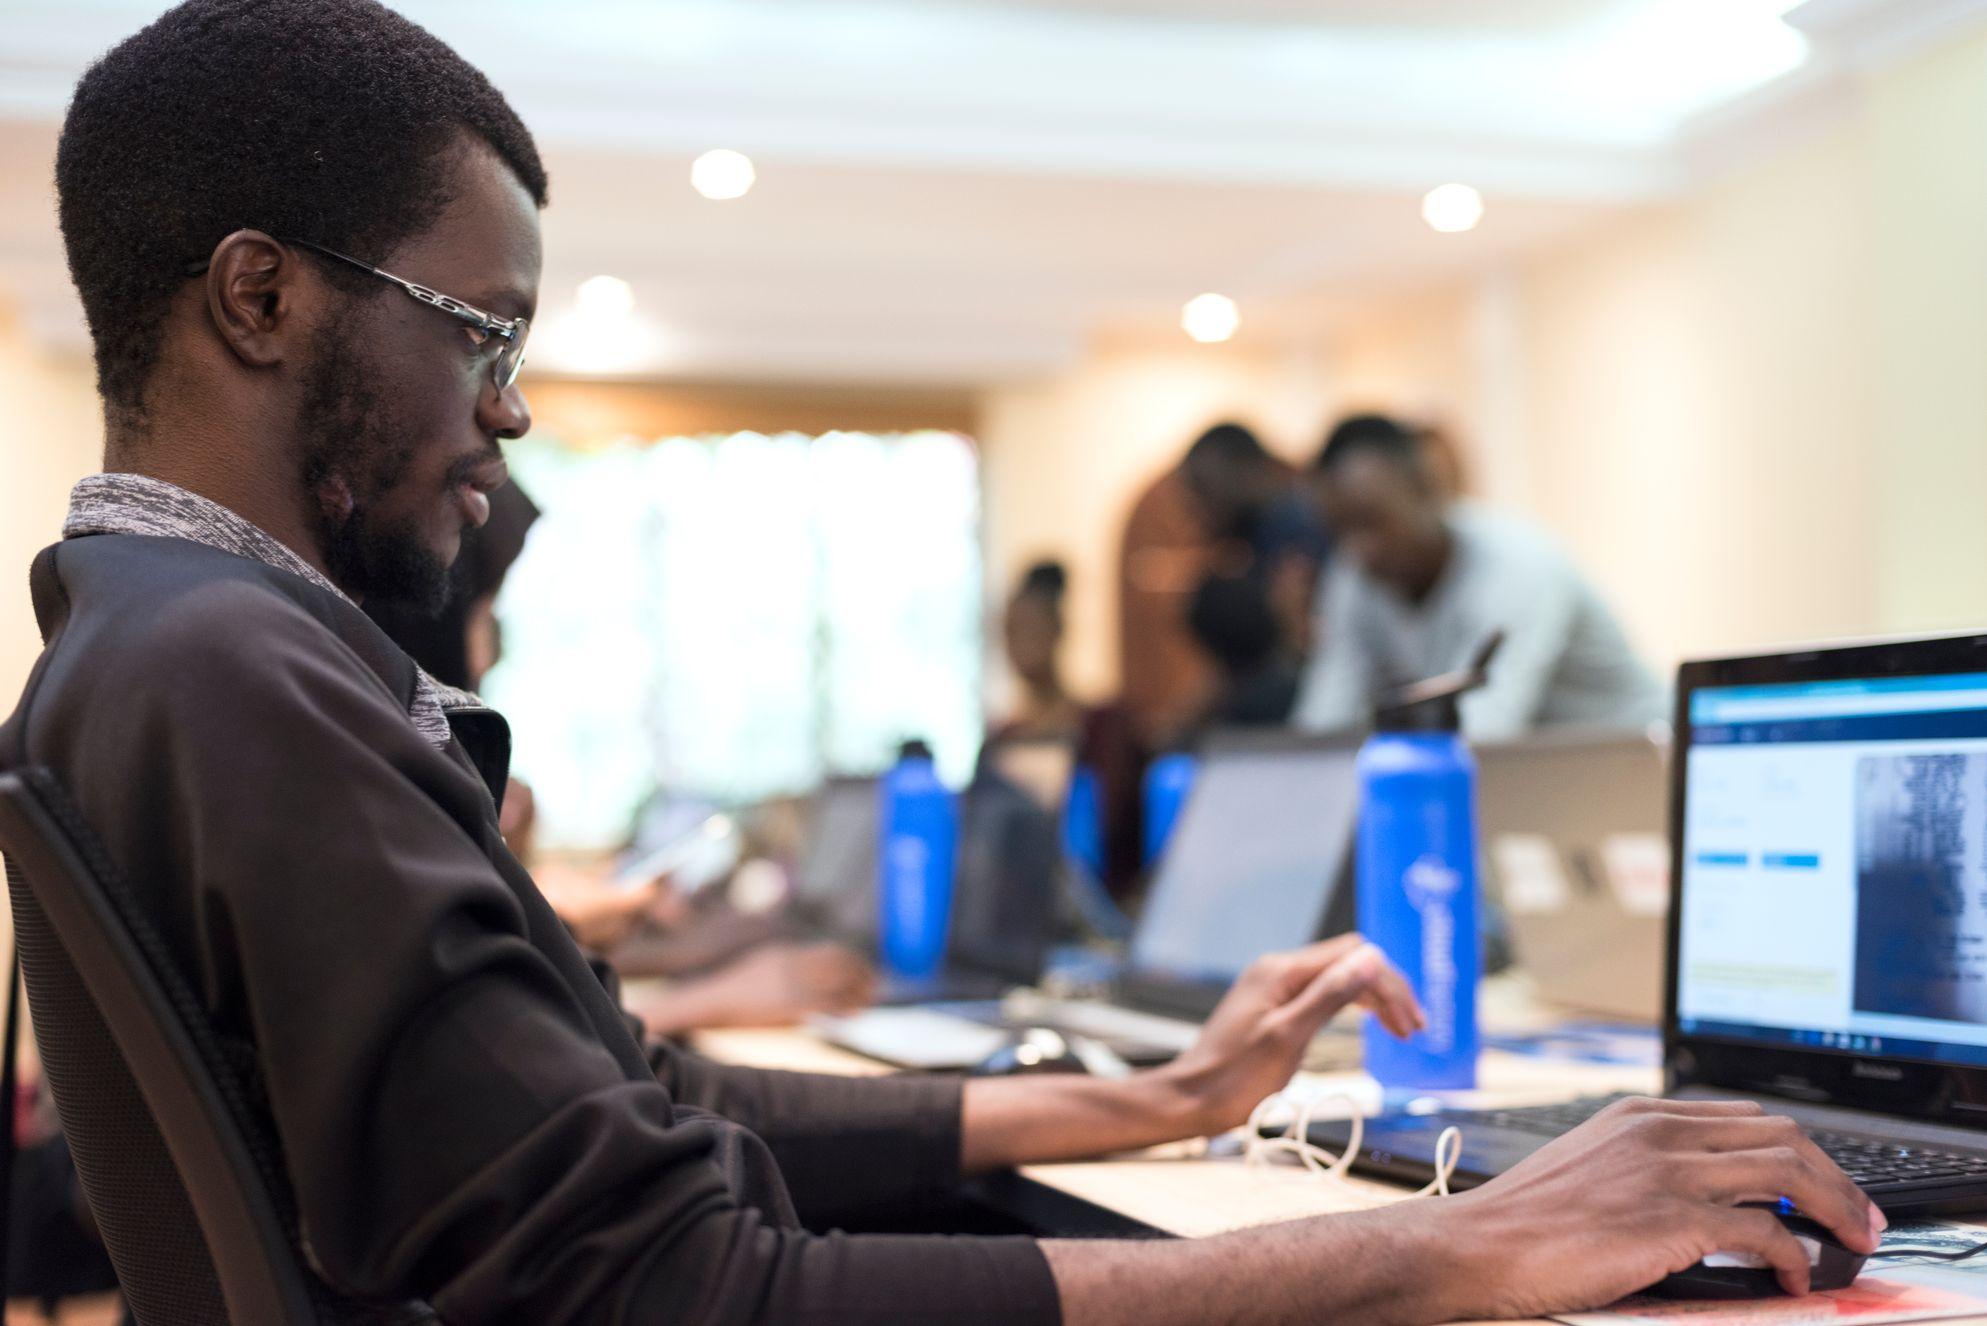 workforce-working-on-computer